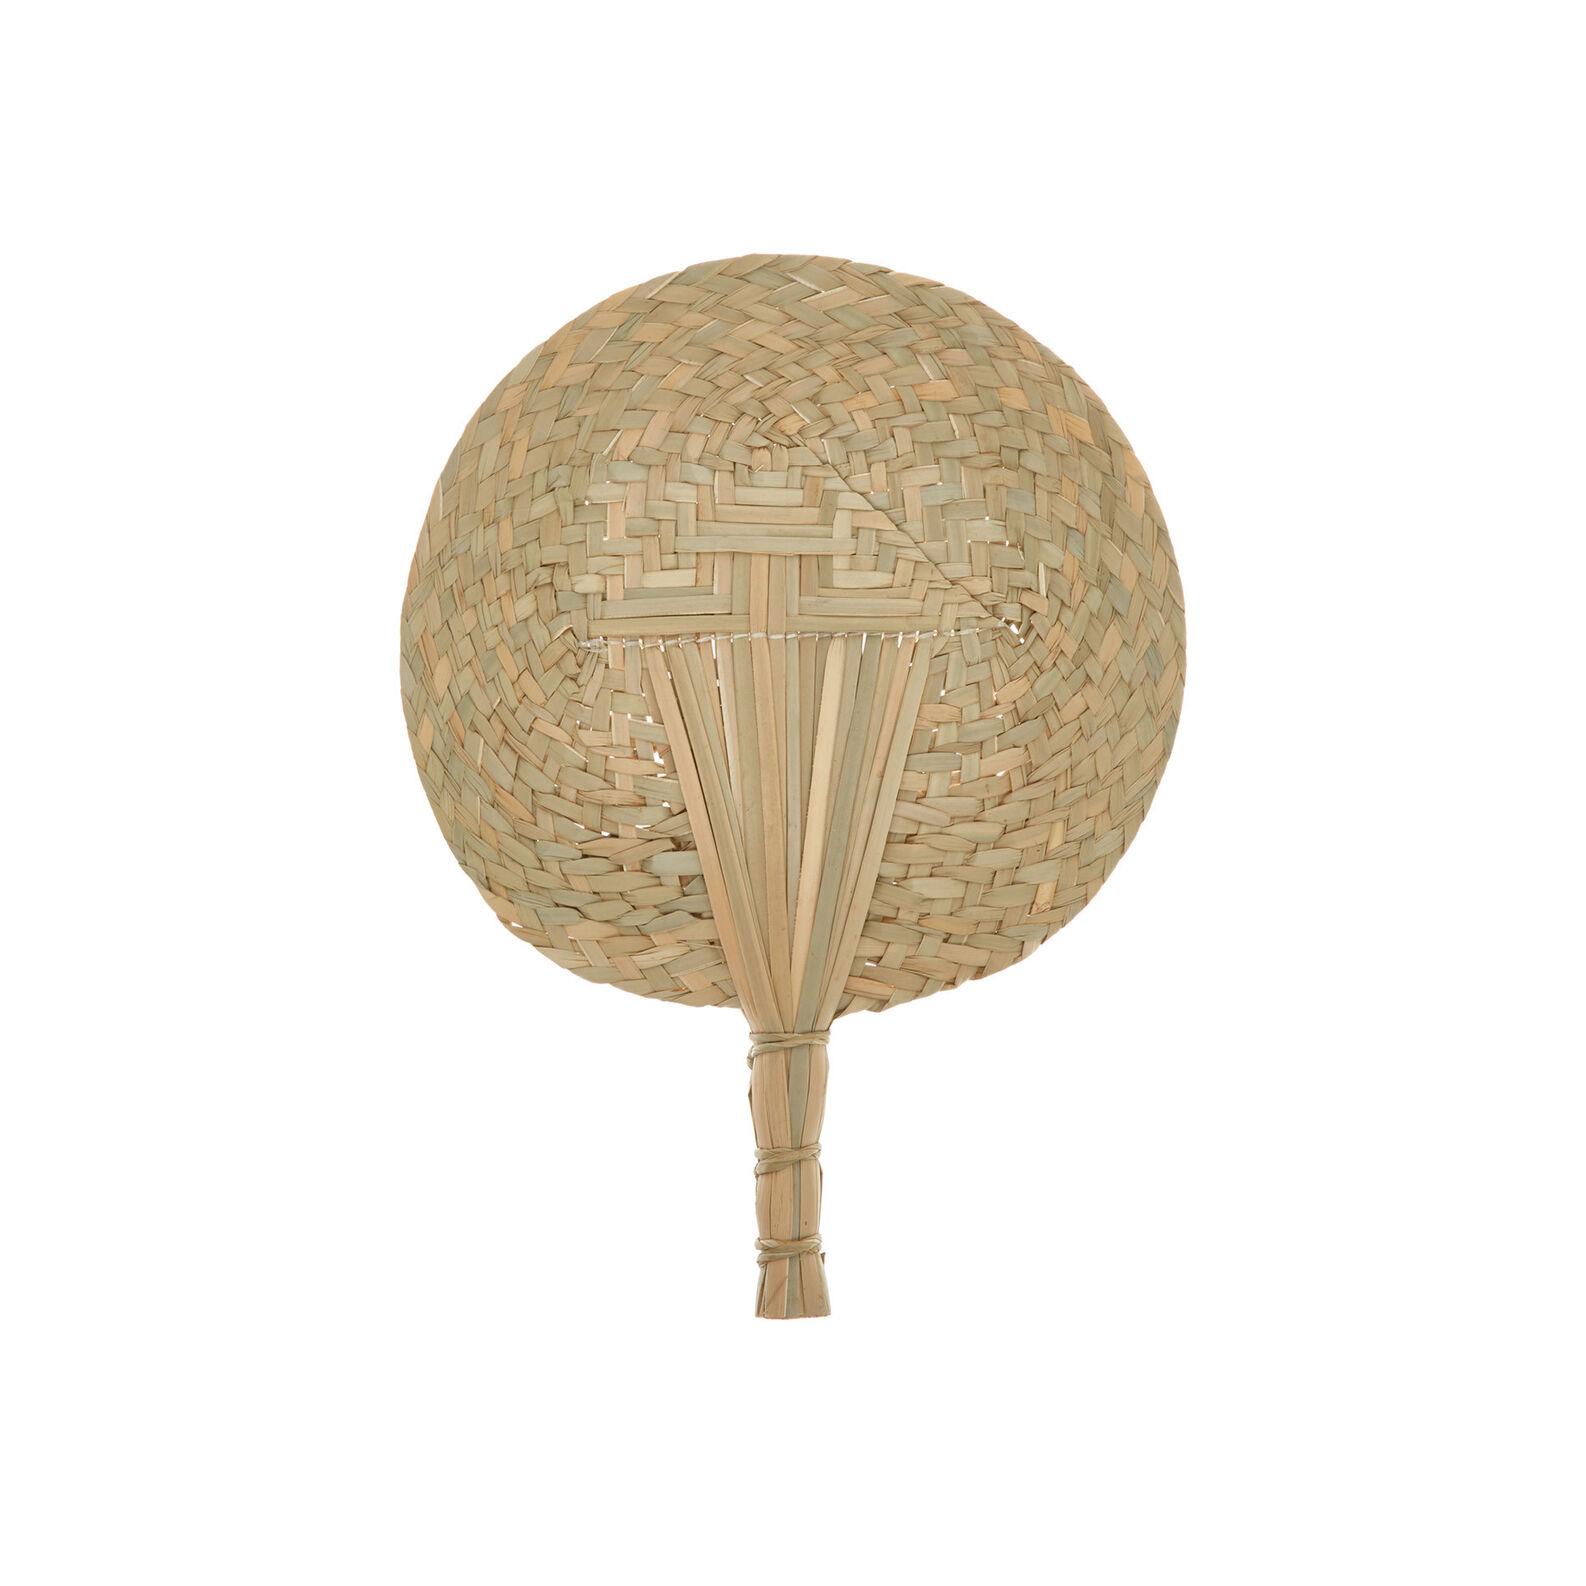 Handwoven decorative straw fan